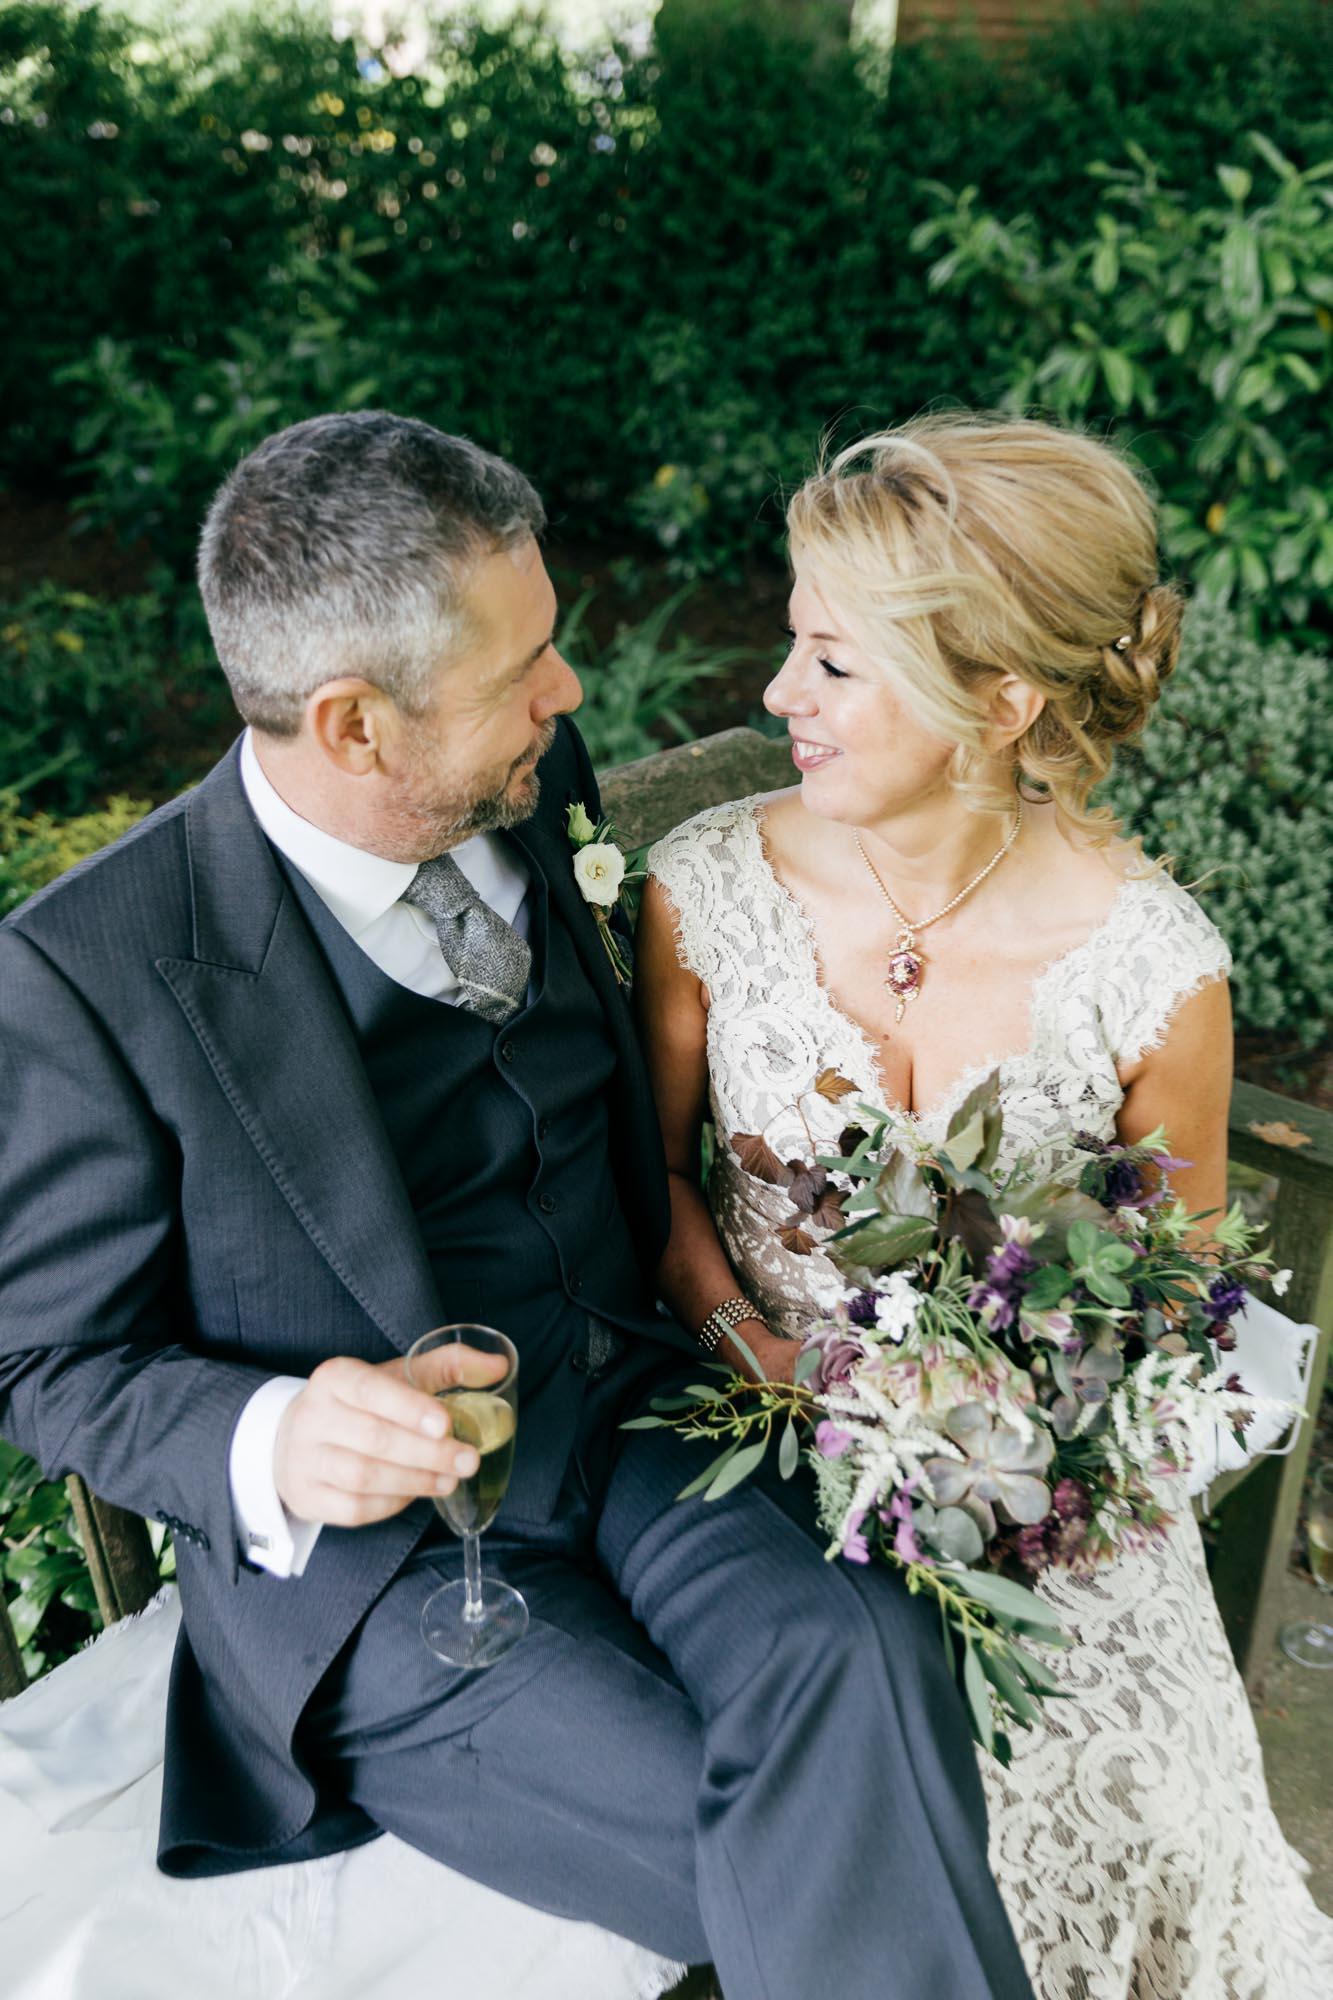 Wedding Portraits by gloucestershire wedding photographer